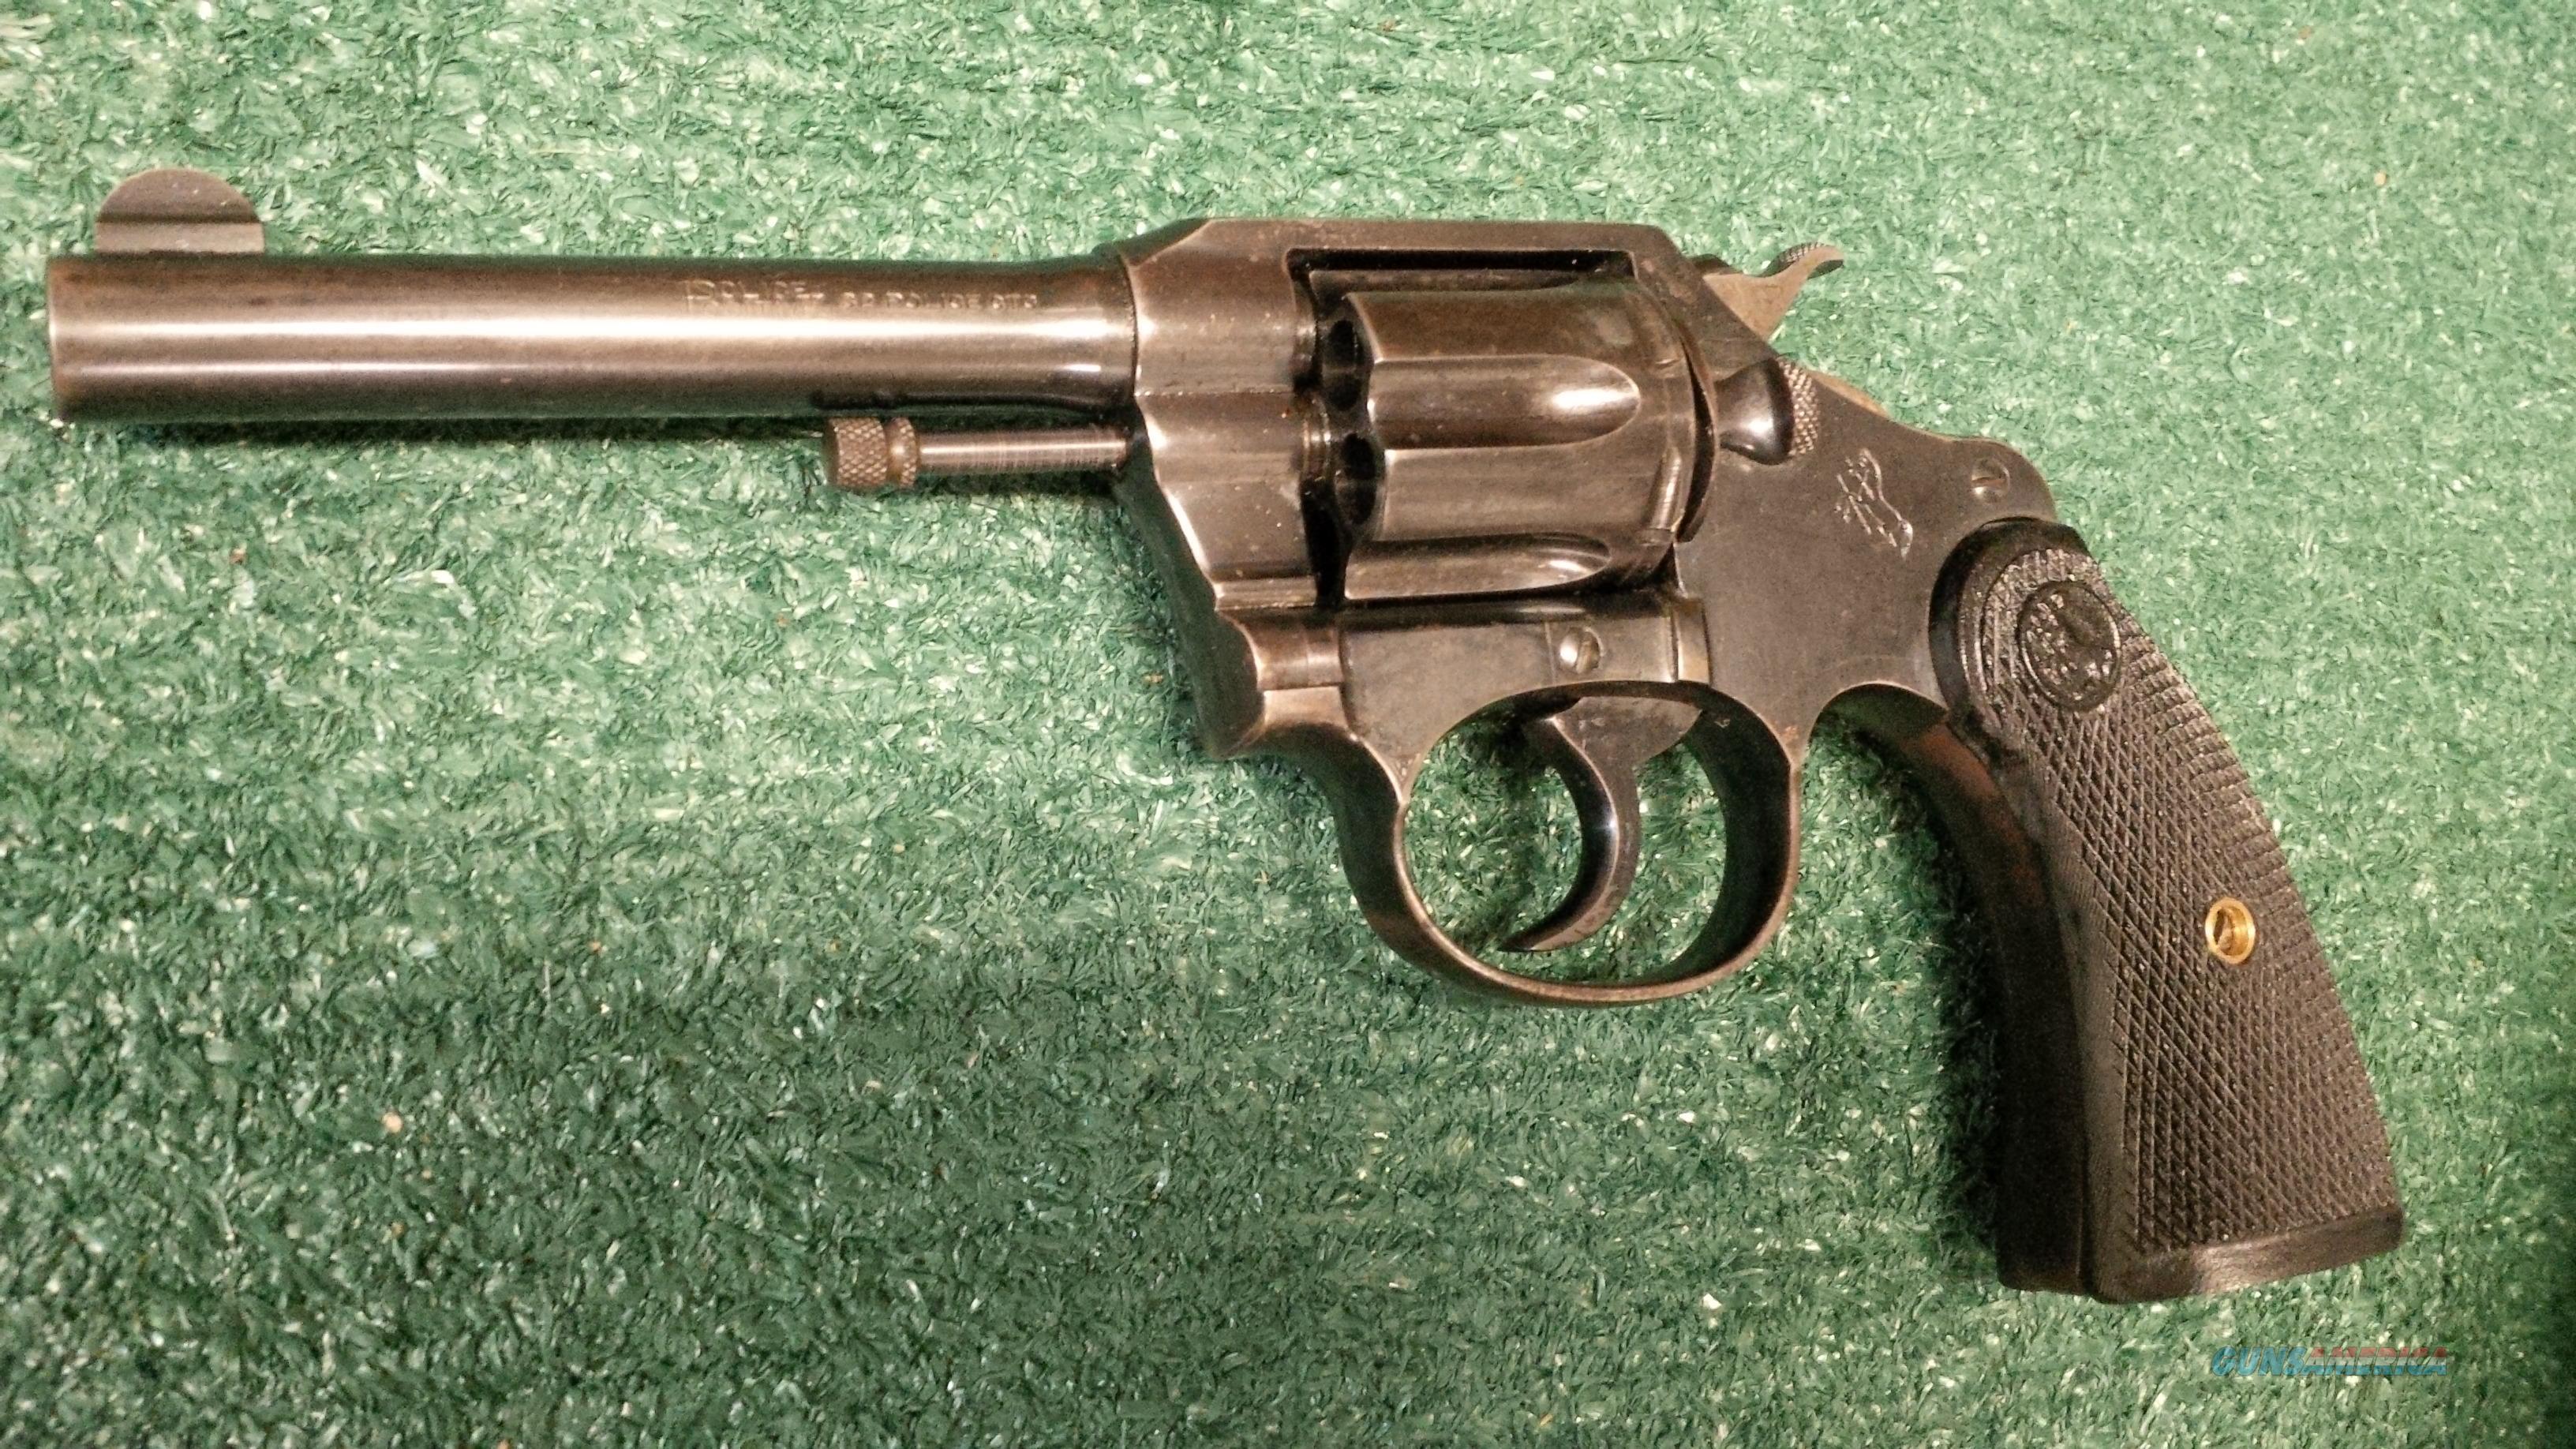 Colt Police Positive .32 Police Ctg 4 Inch Double Action Revolver  Guns > Pistols > Colt Double Action Revolvers- Pre-1945